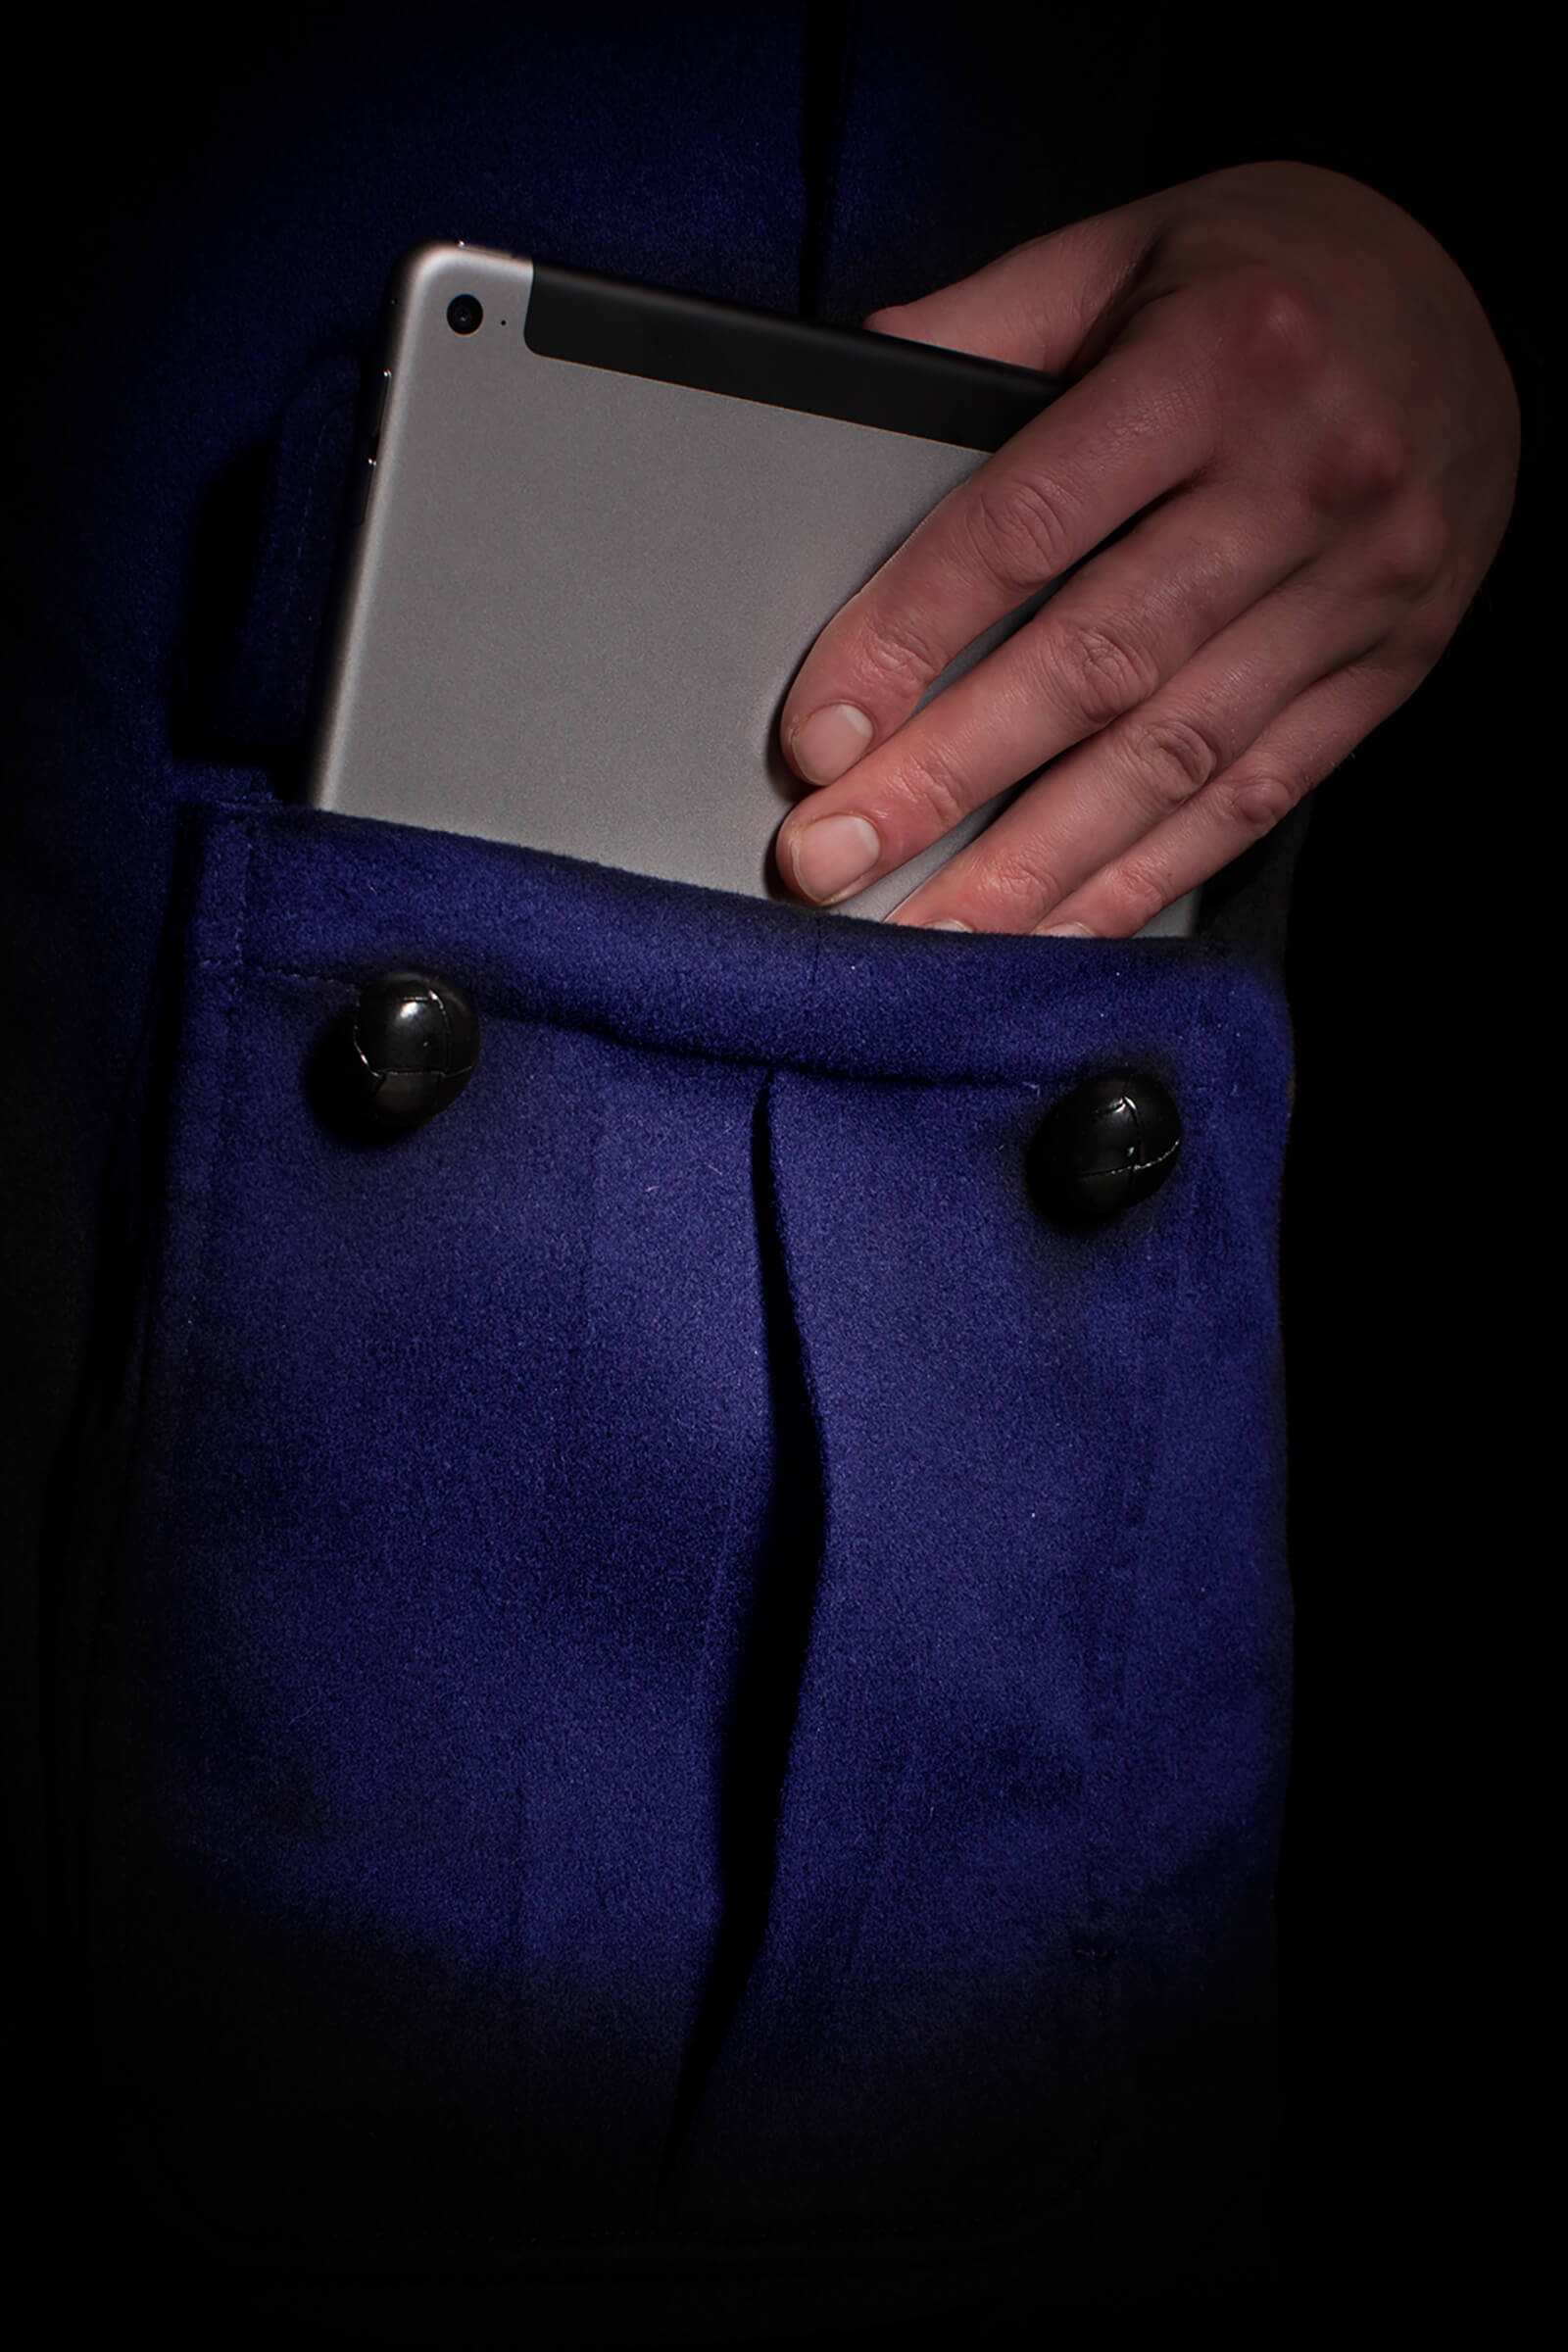 blue-coloured iPad size cashmere pocket